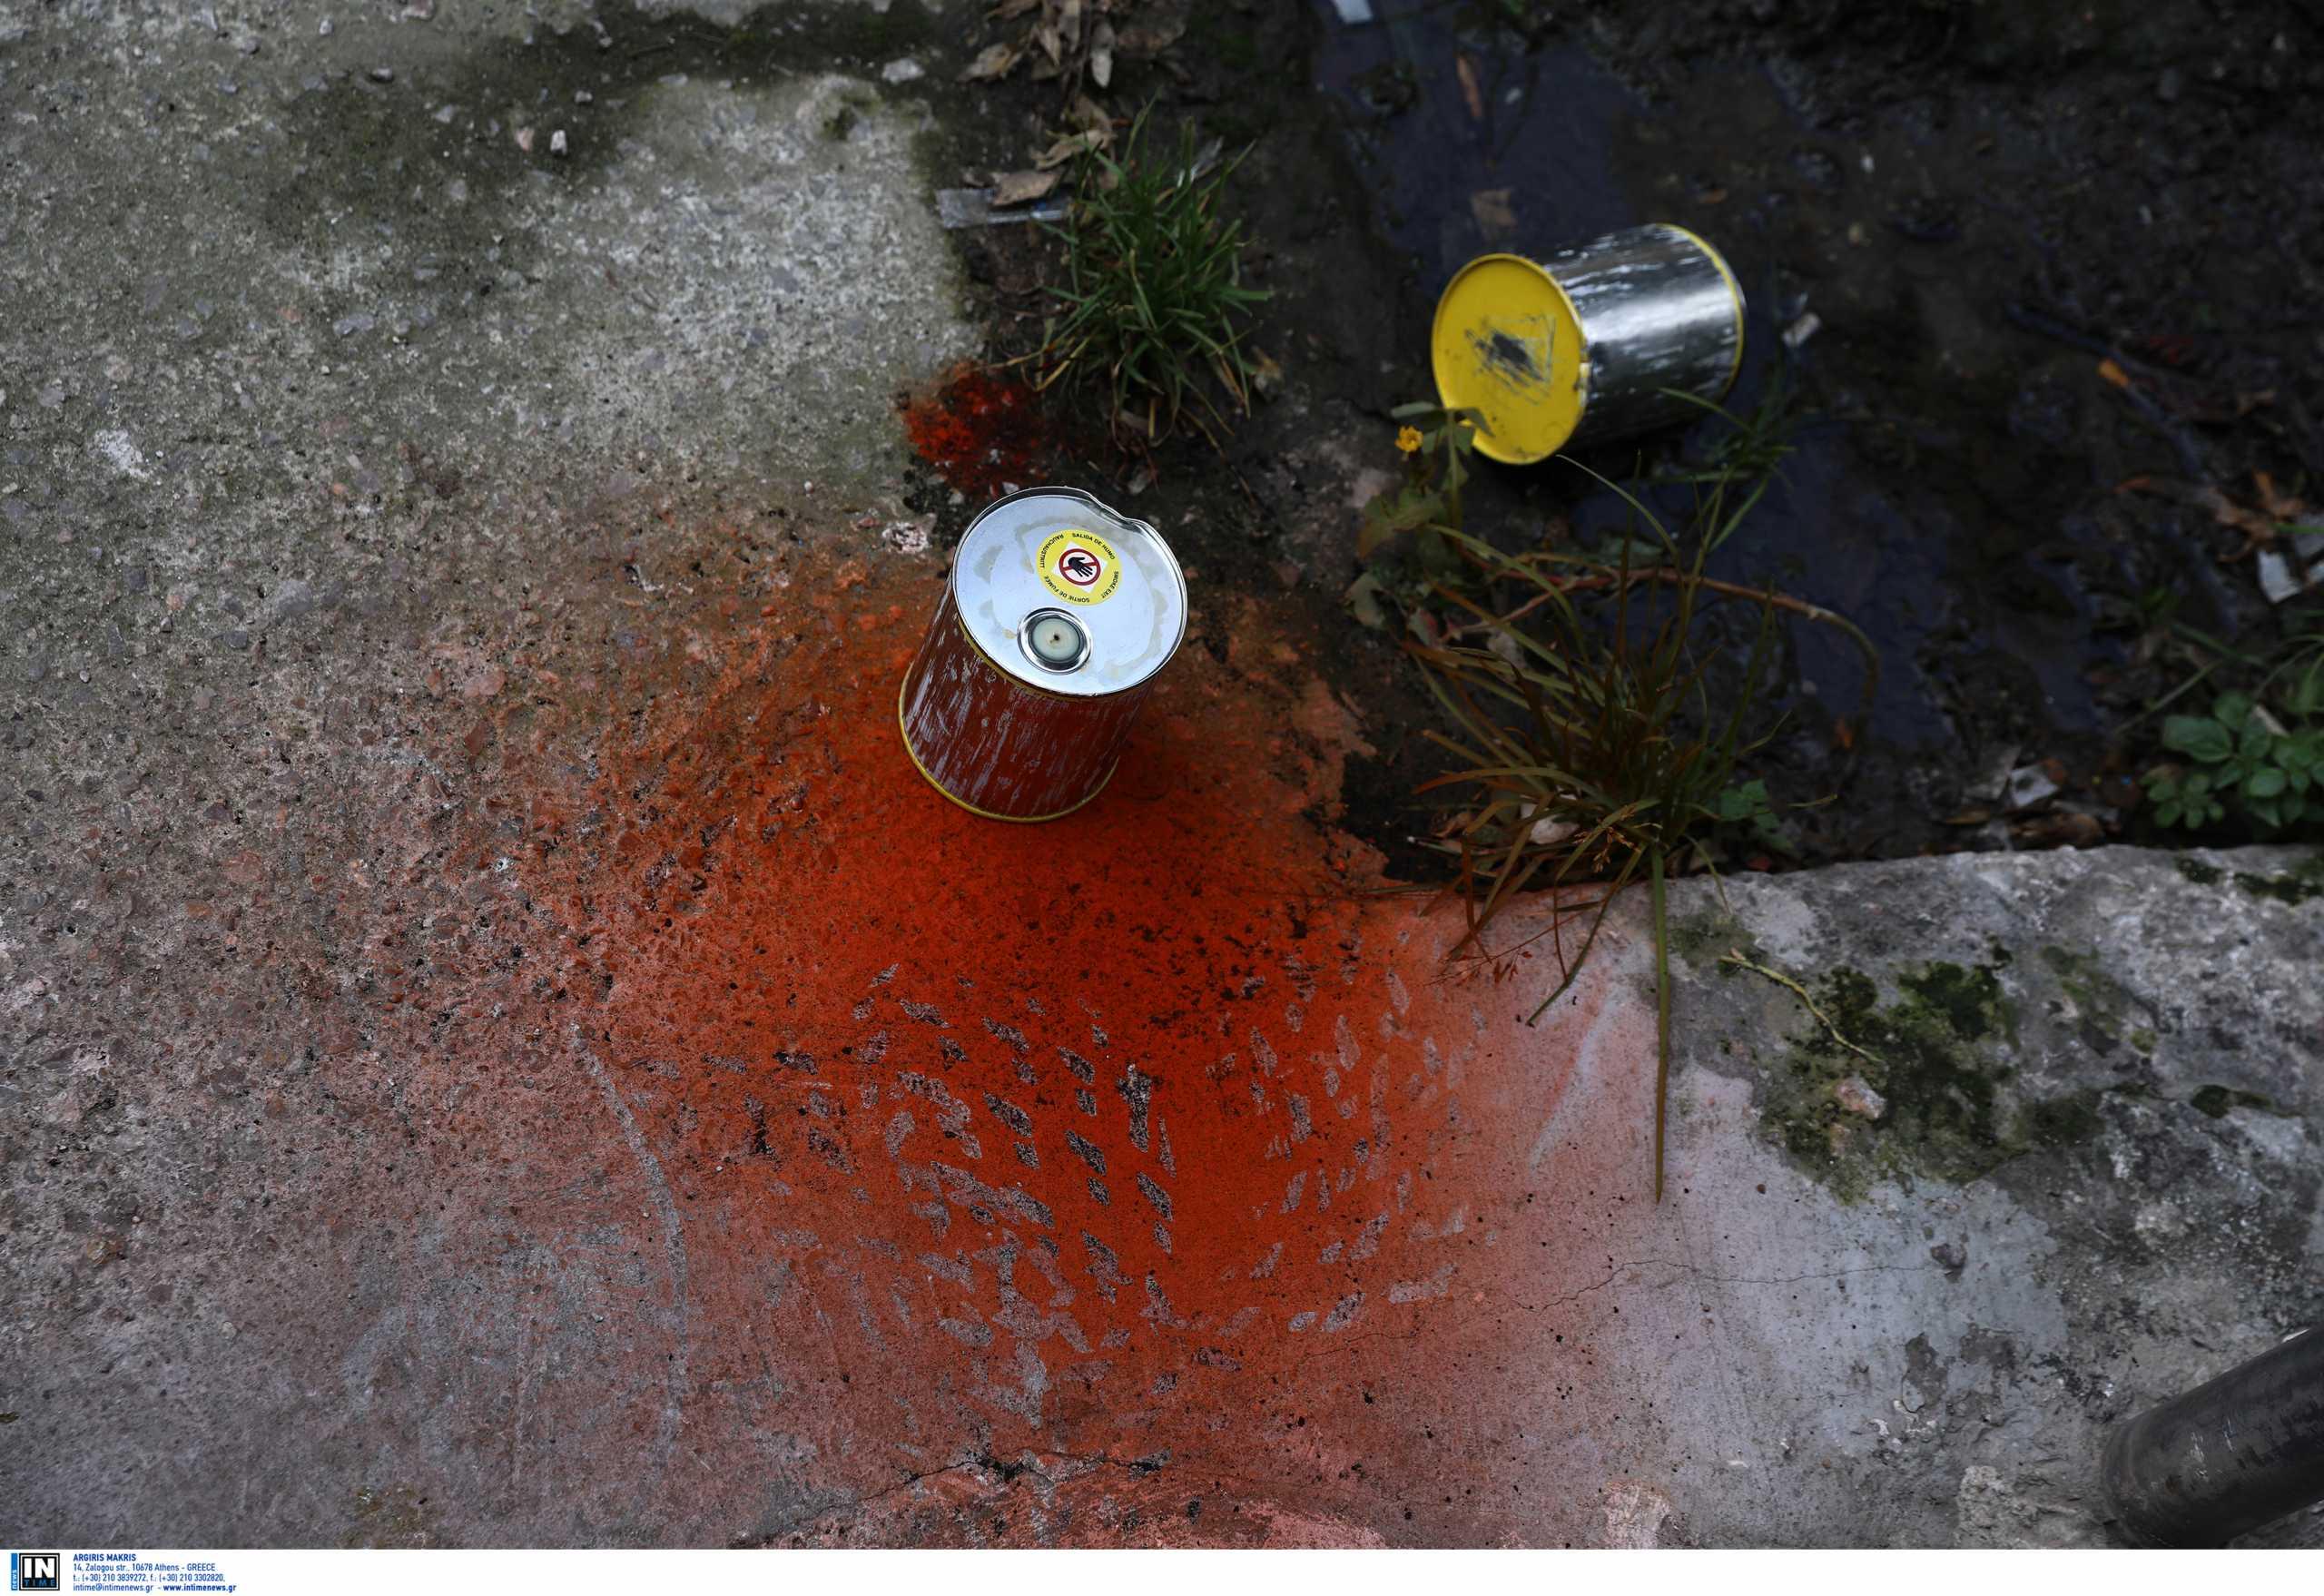 Video ντοκουμέντο από την καταδρομική επίθεση στο ΑΤ Καισαριανής